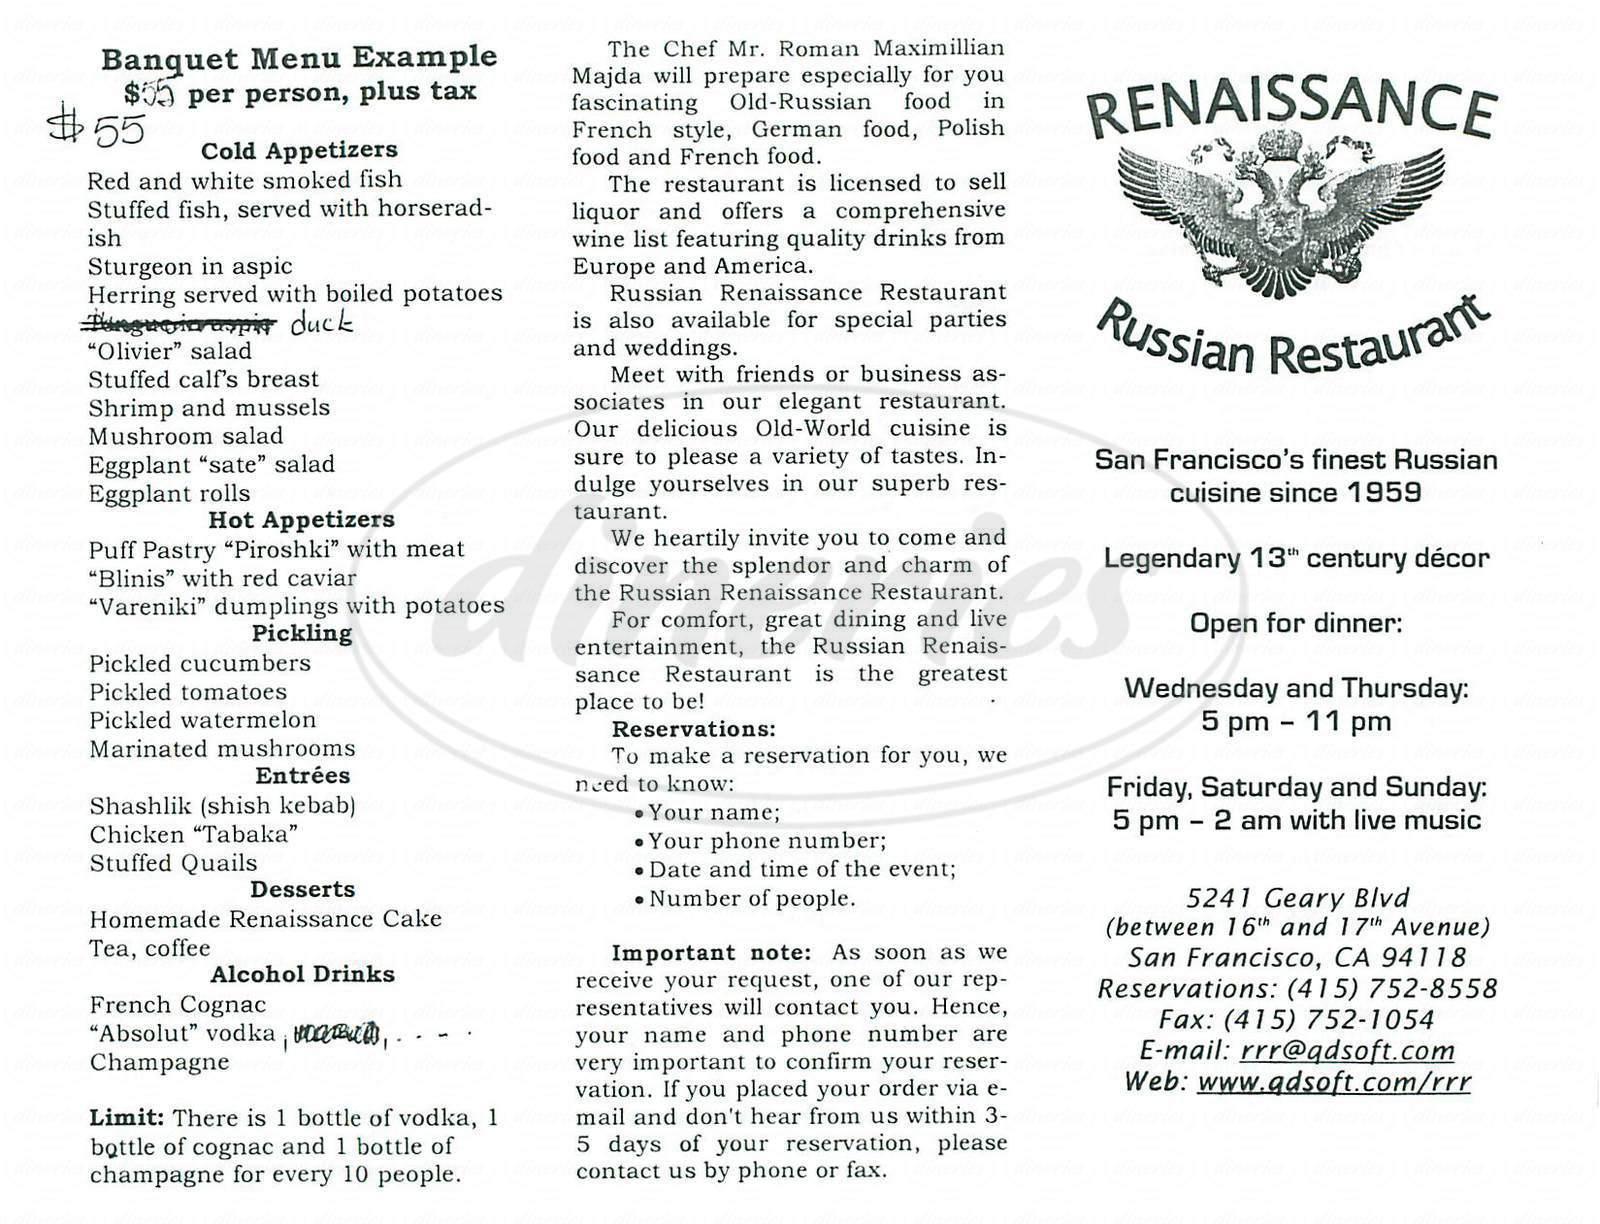 Russian Renaissance Restaurant  Geary Blvd San Francisco Ca